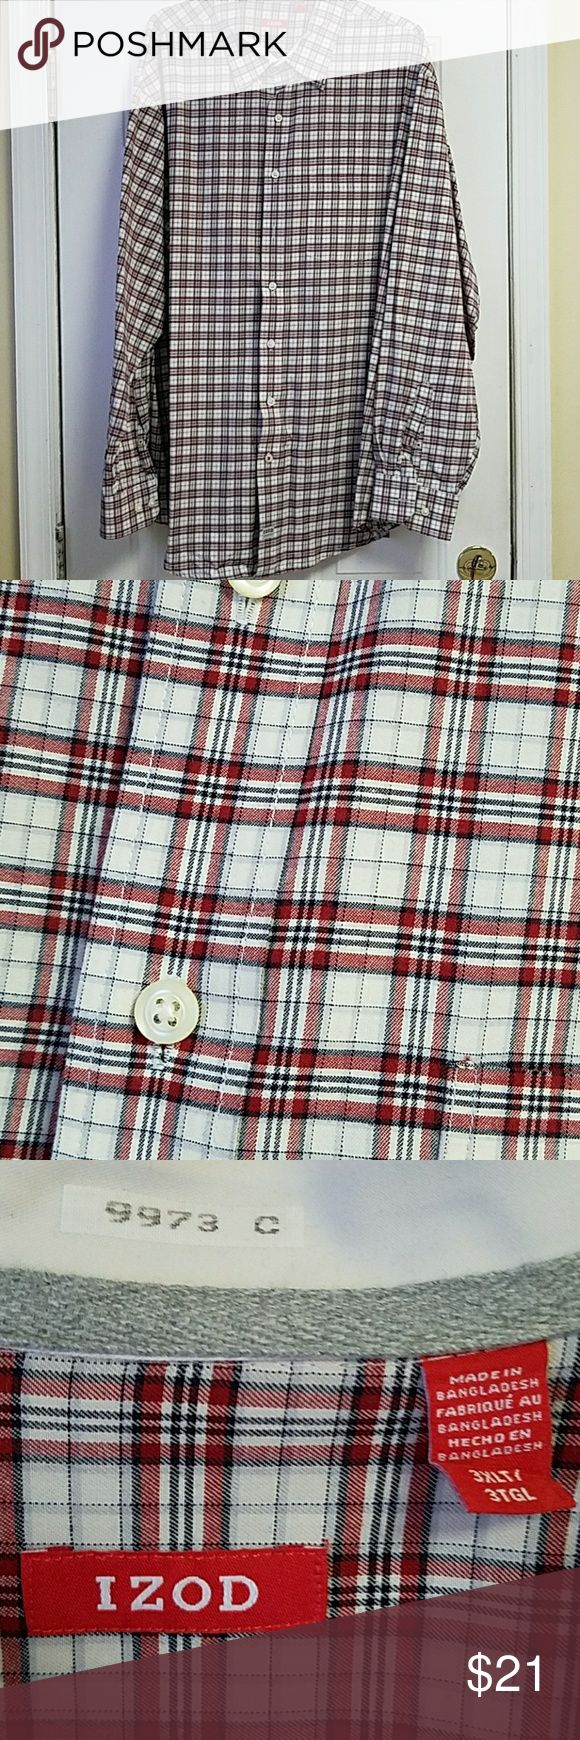 Big& Tall Men's shirt Size 3XLT Long sleeve button down 100% cotton Izod Shirts Dress Shirts